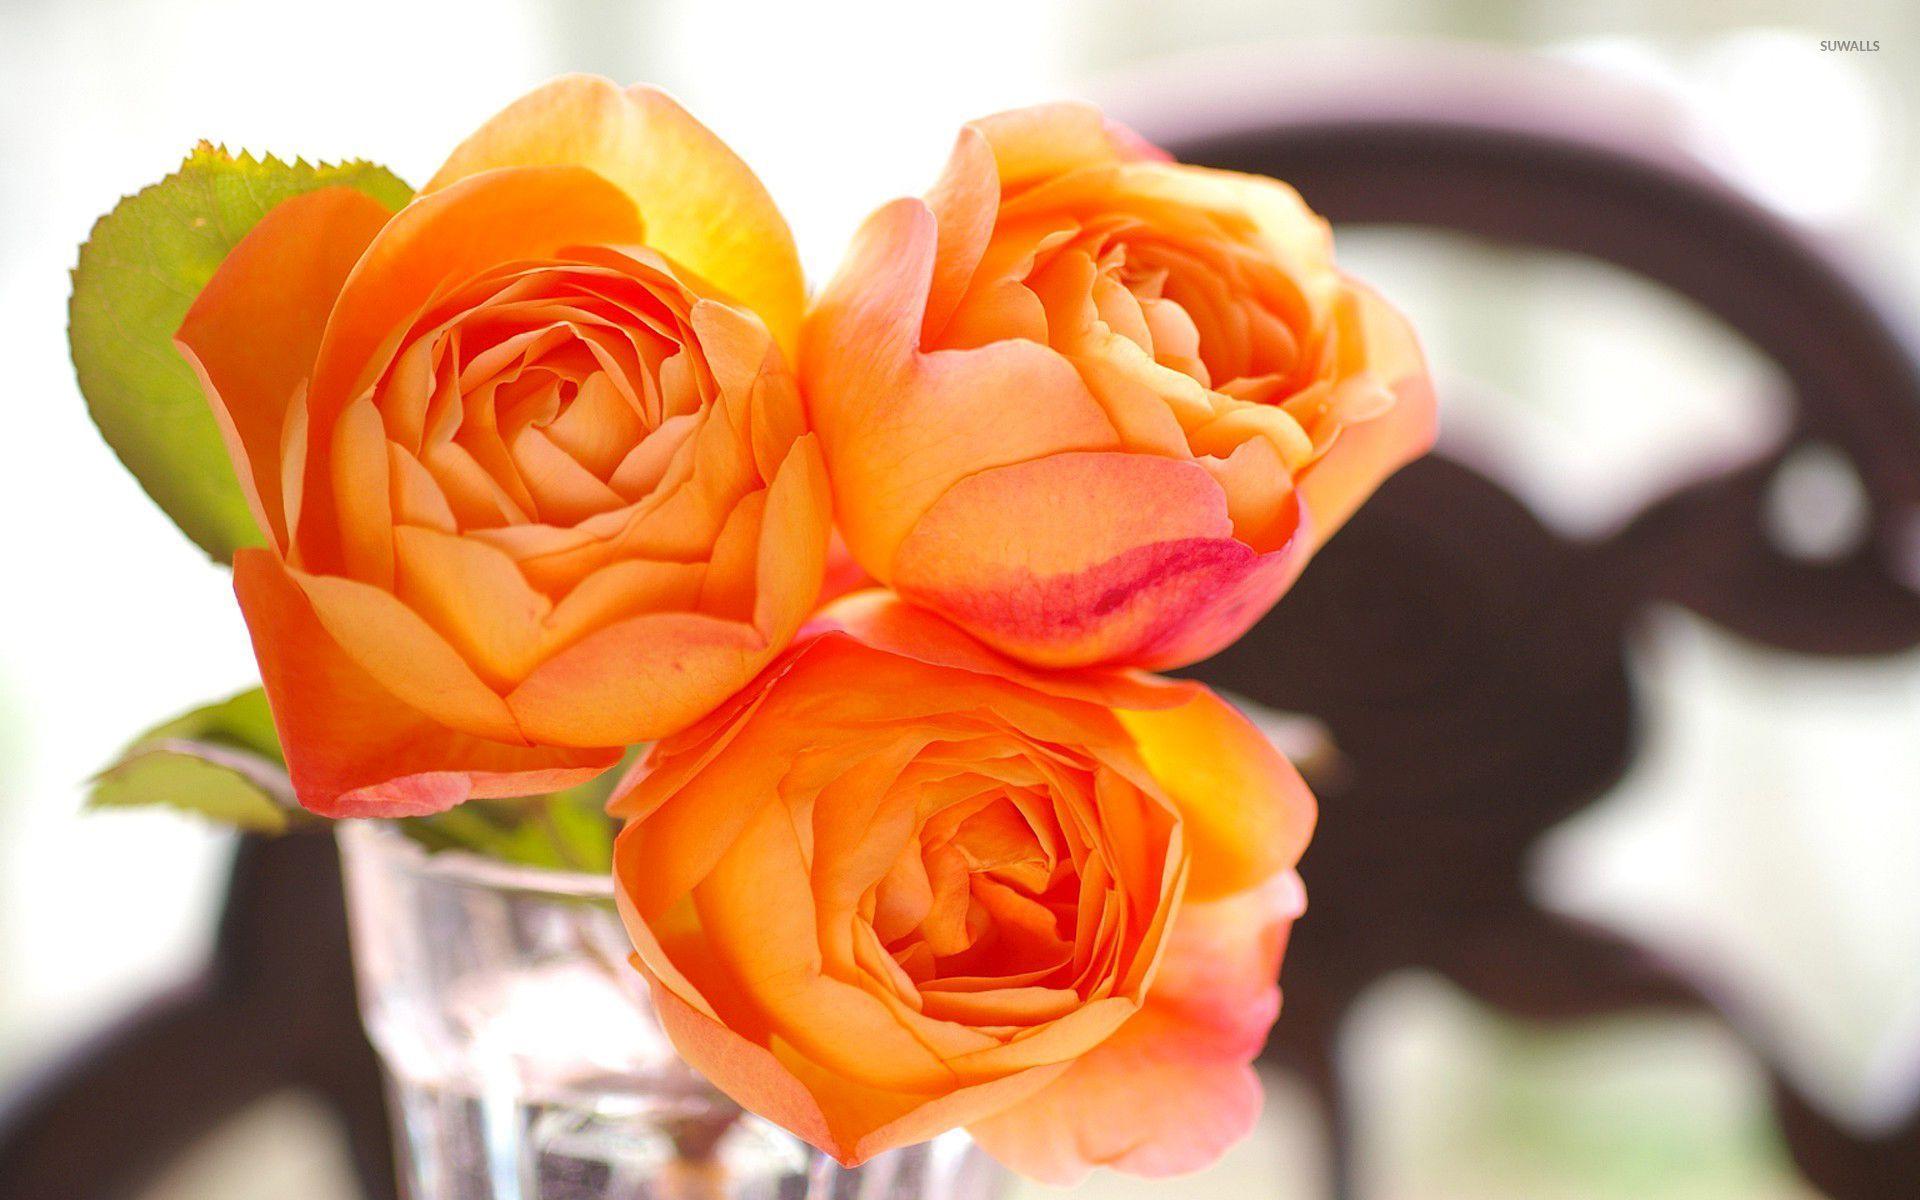 orange roses 5 wallpaper flower wallpapers 34115